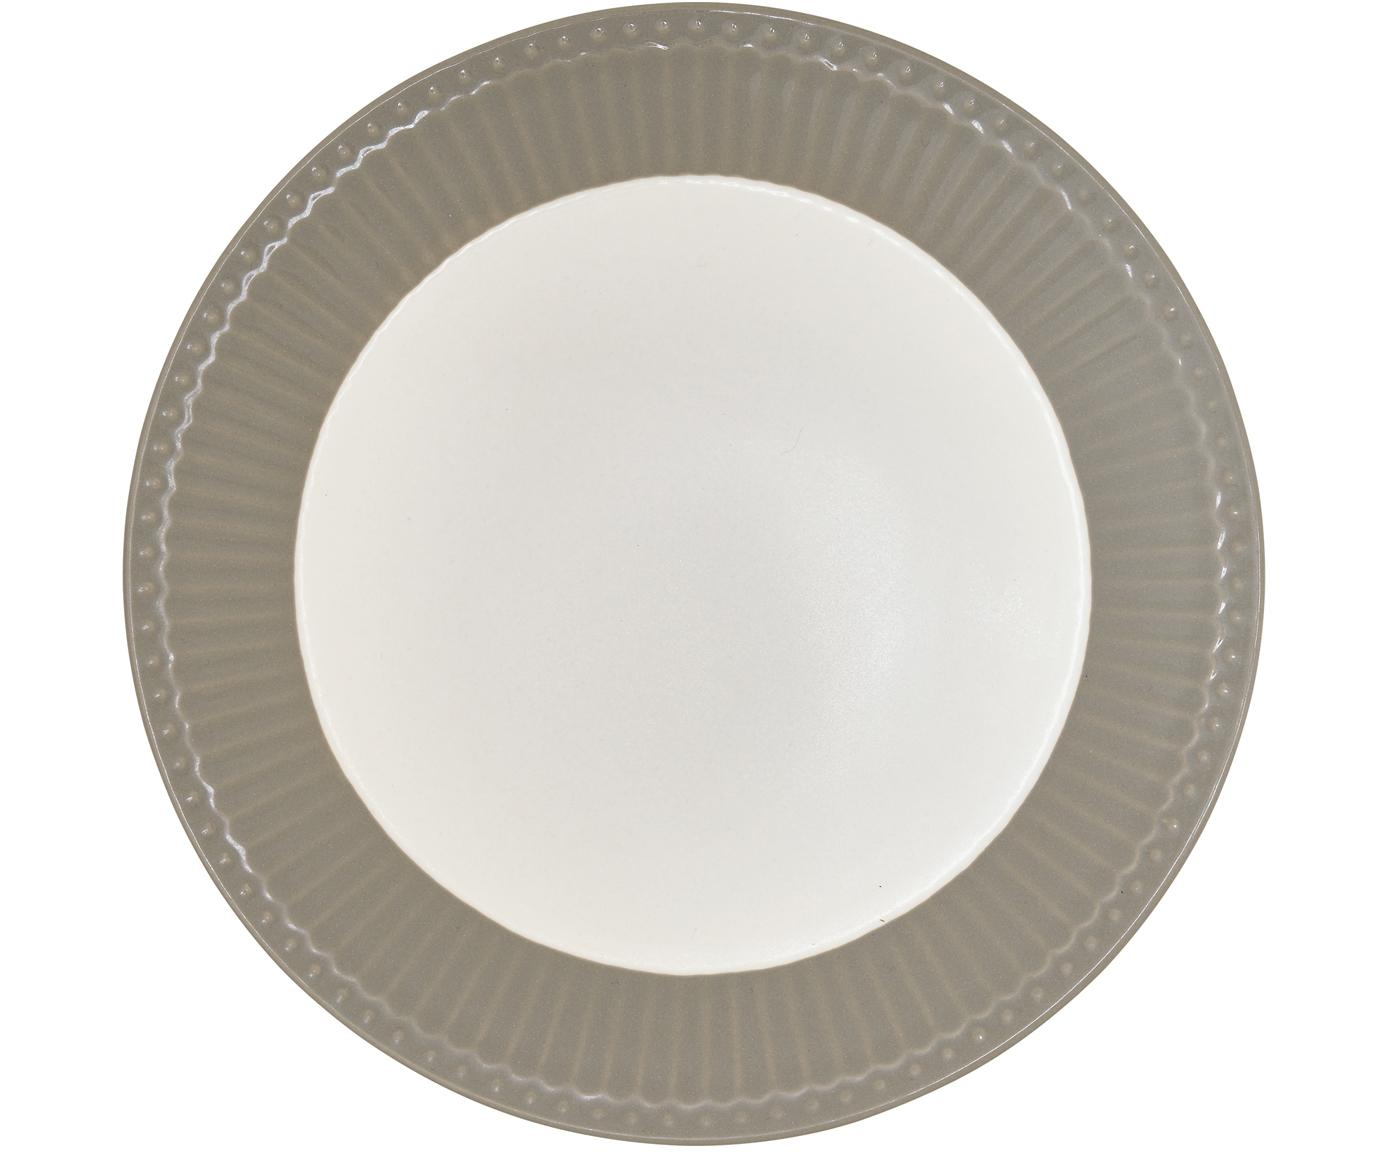 Ontbijtbord Alice, 2 stuks, Porselein, Grijs, wit, Ø 23 cm